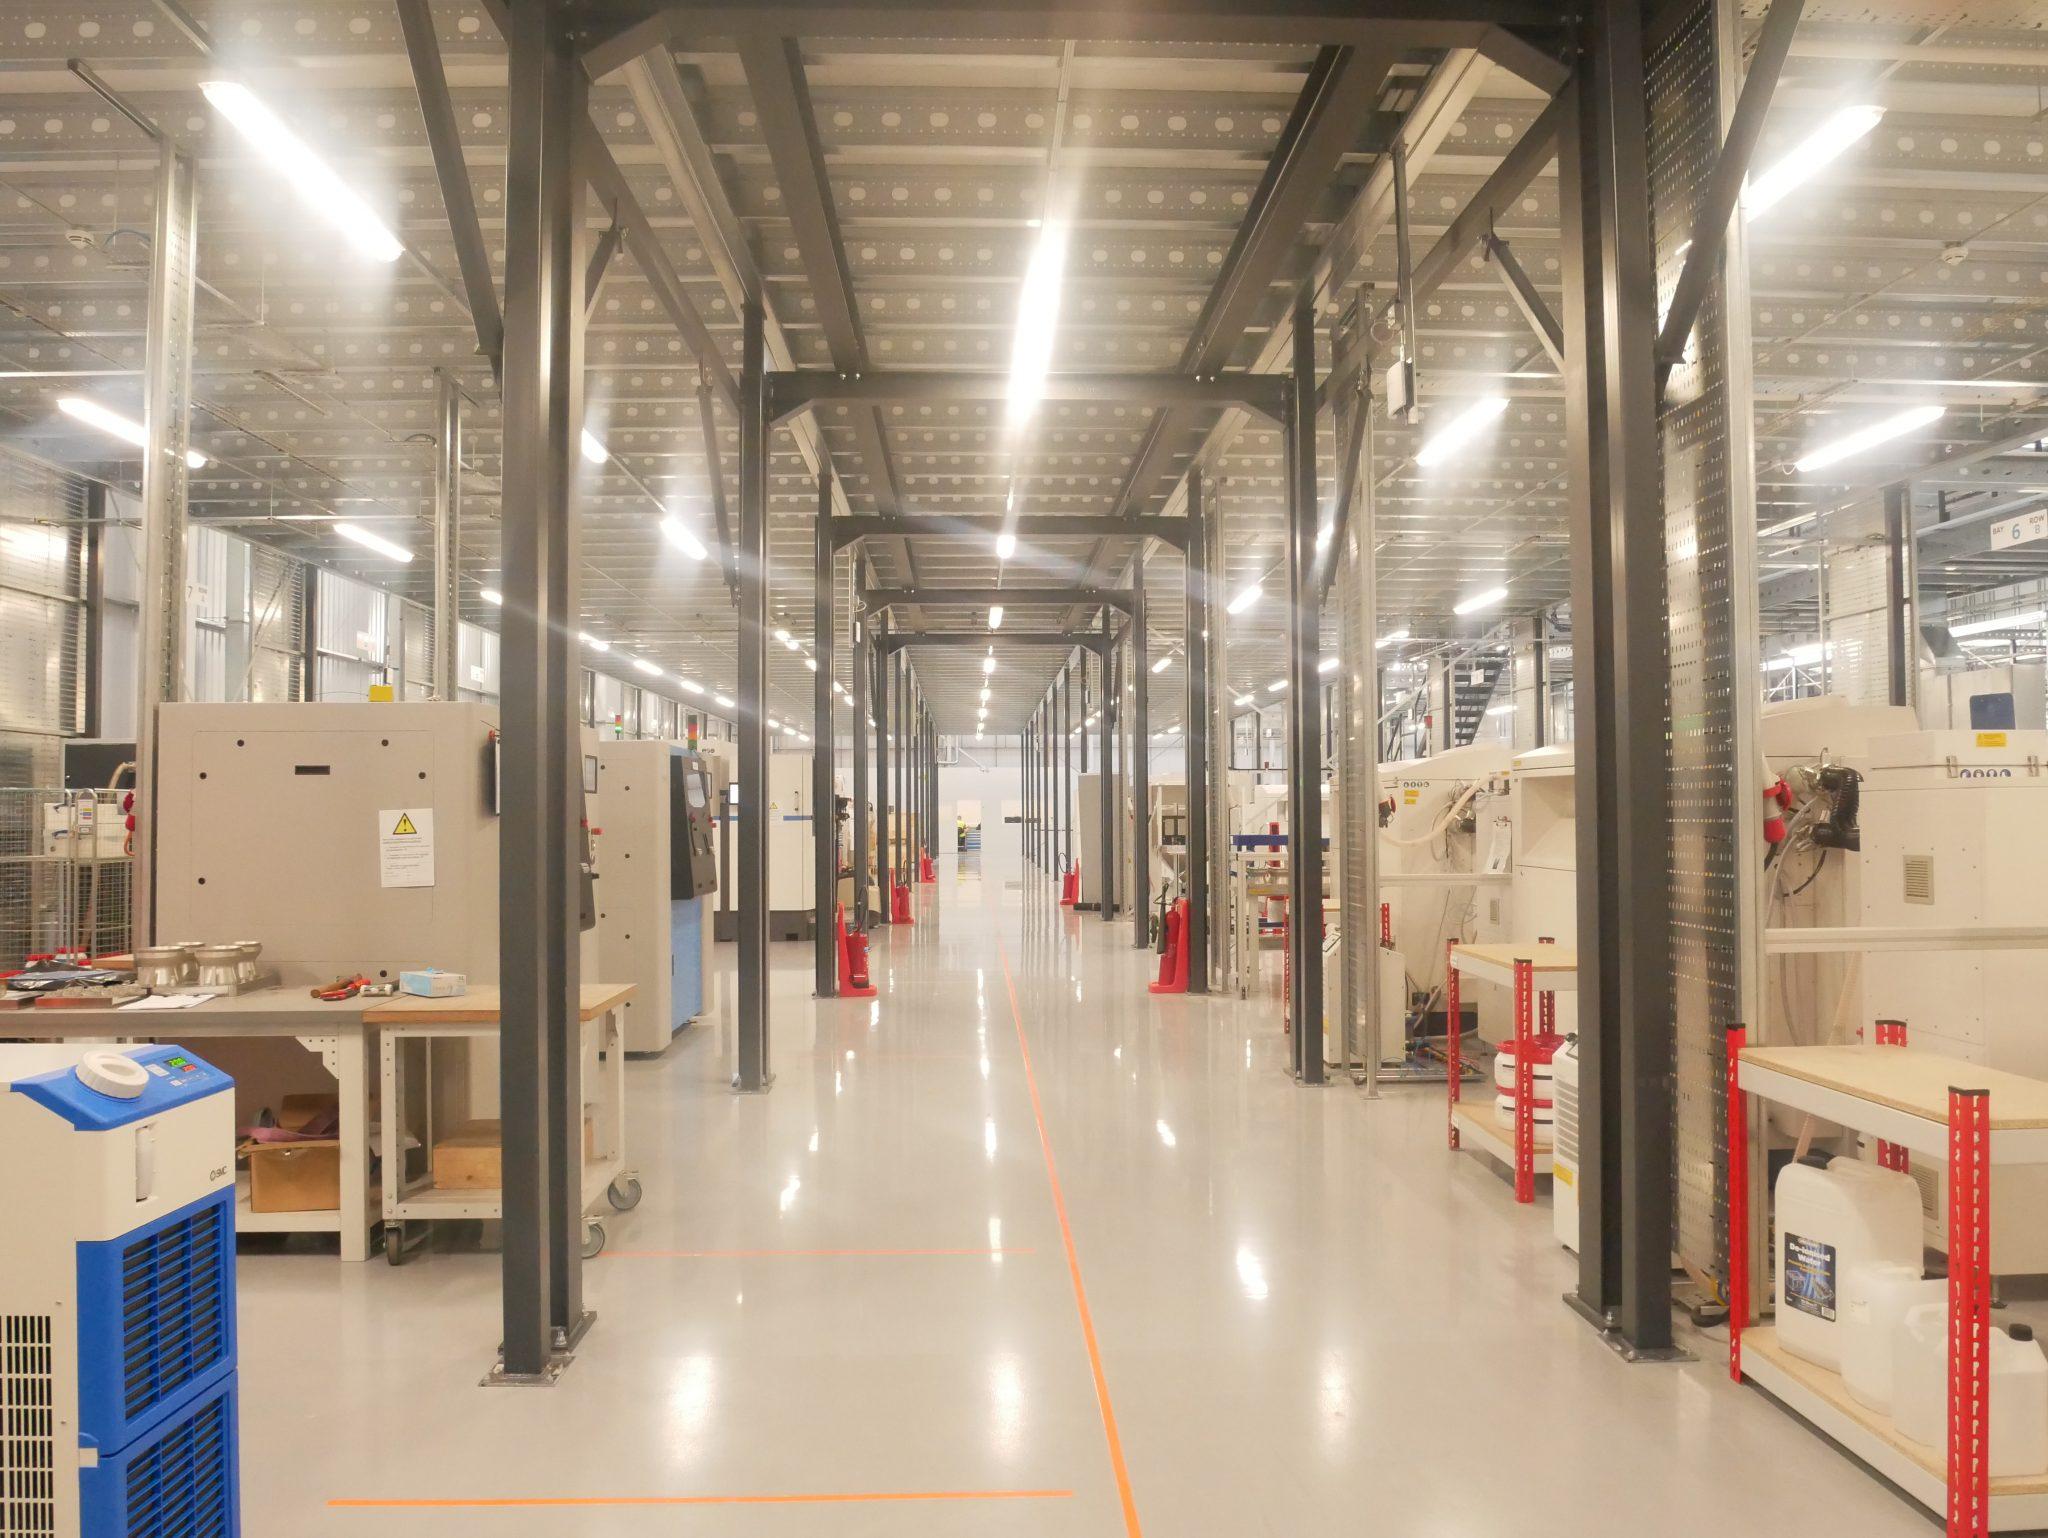 Inside the Materials Solutions Digital Factory. Photo by Tia Vialva.